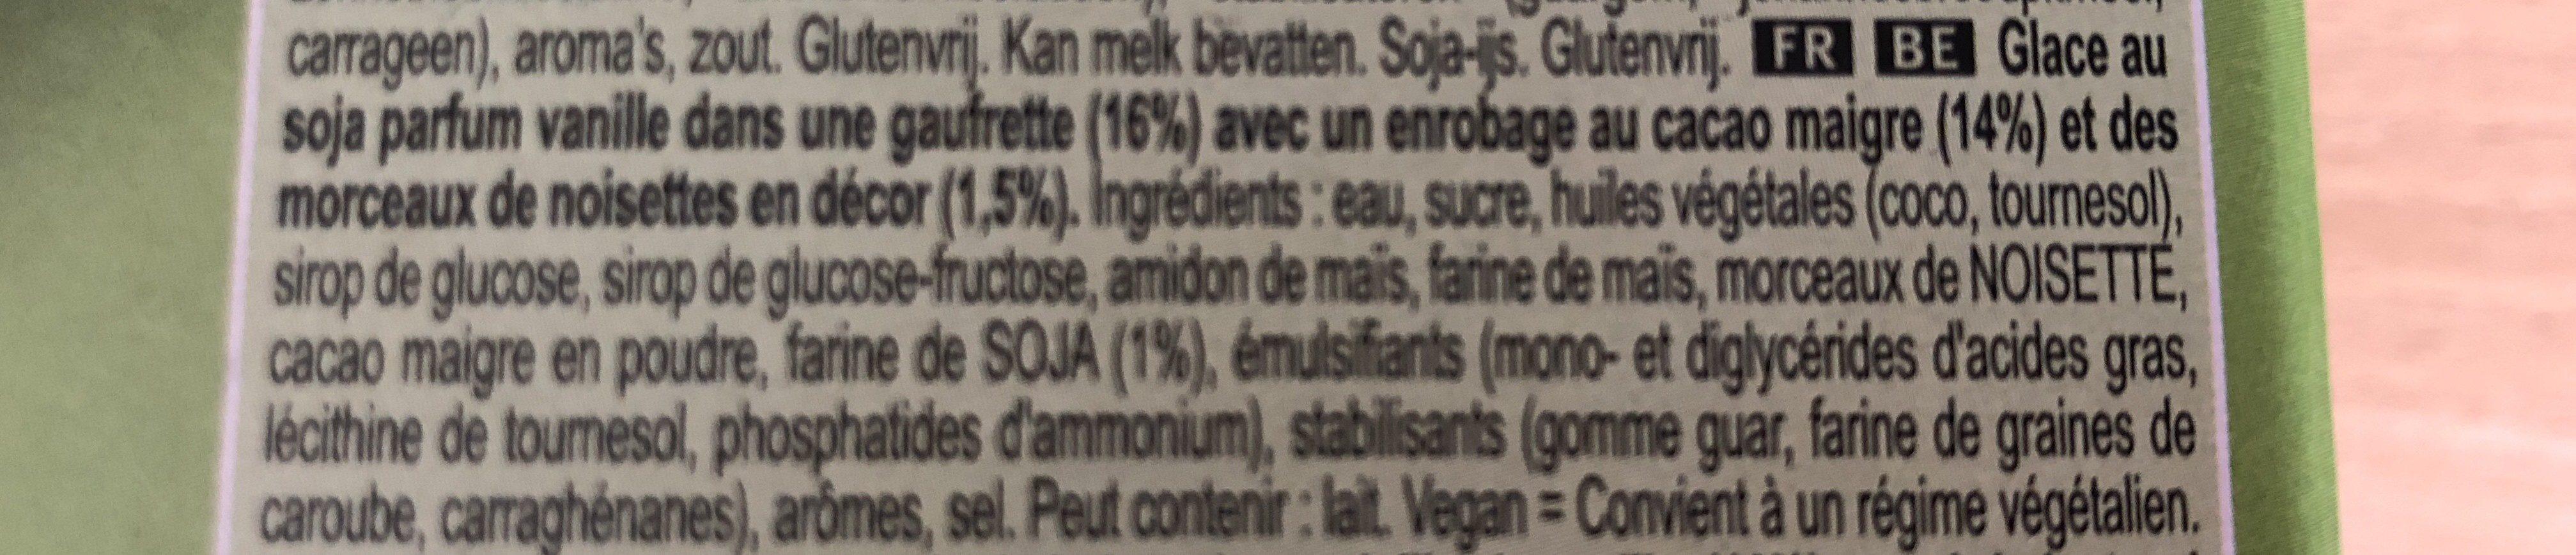 Cornetto au Soja sans gluten - Ingrediënten